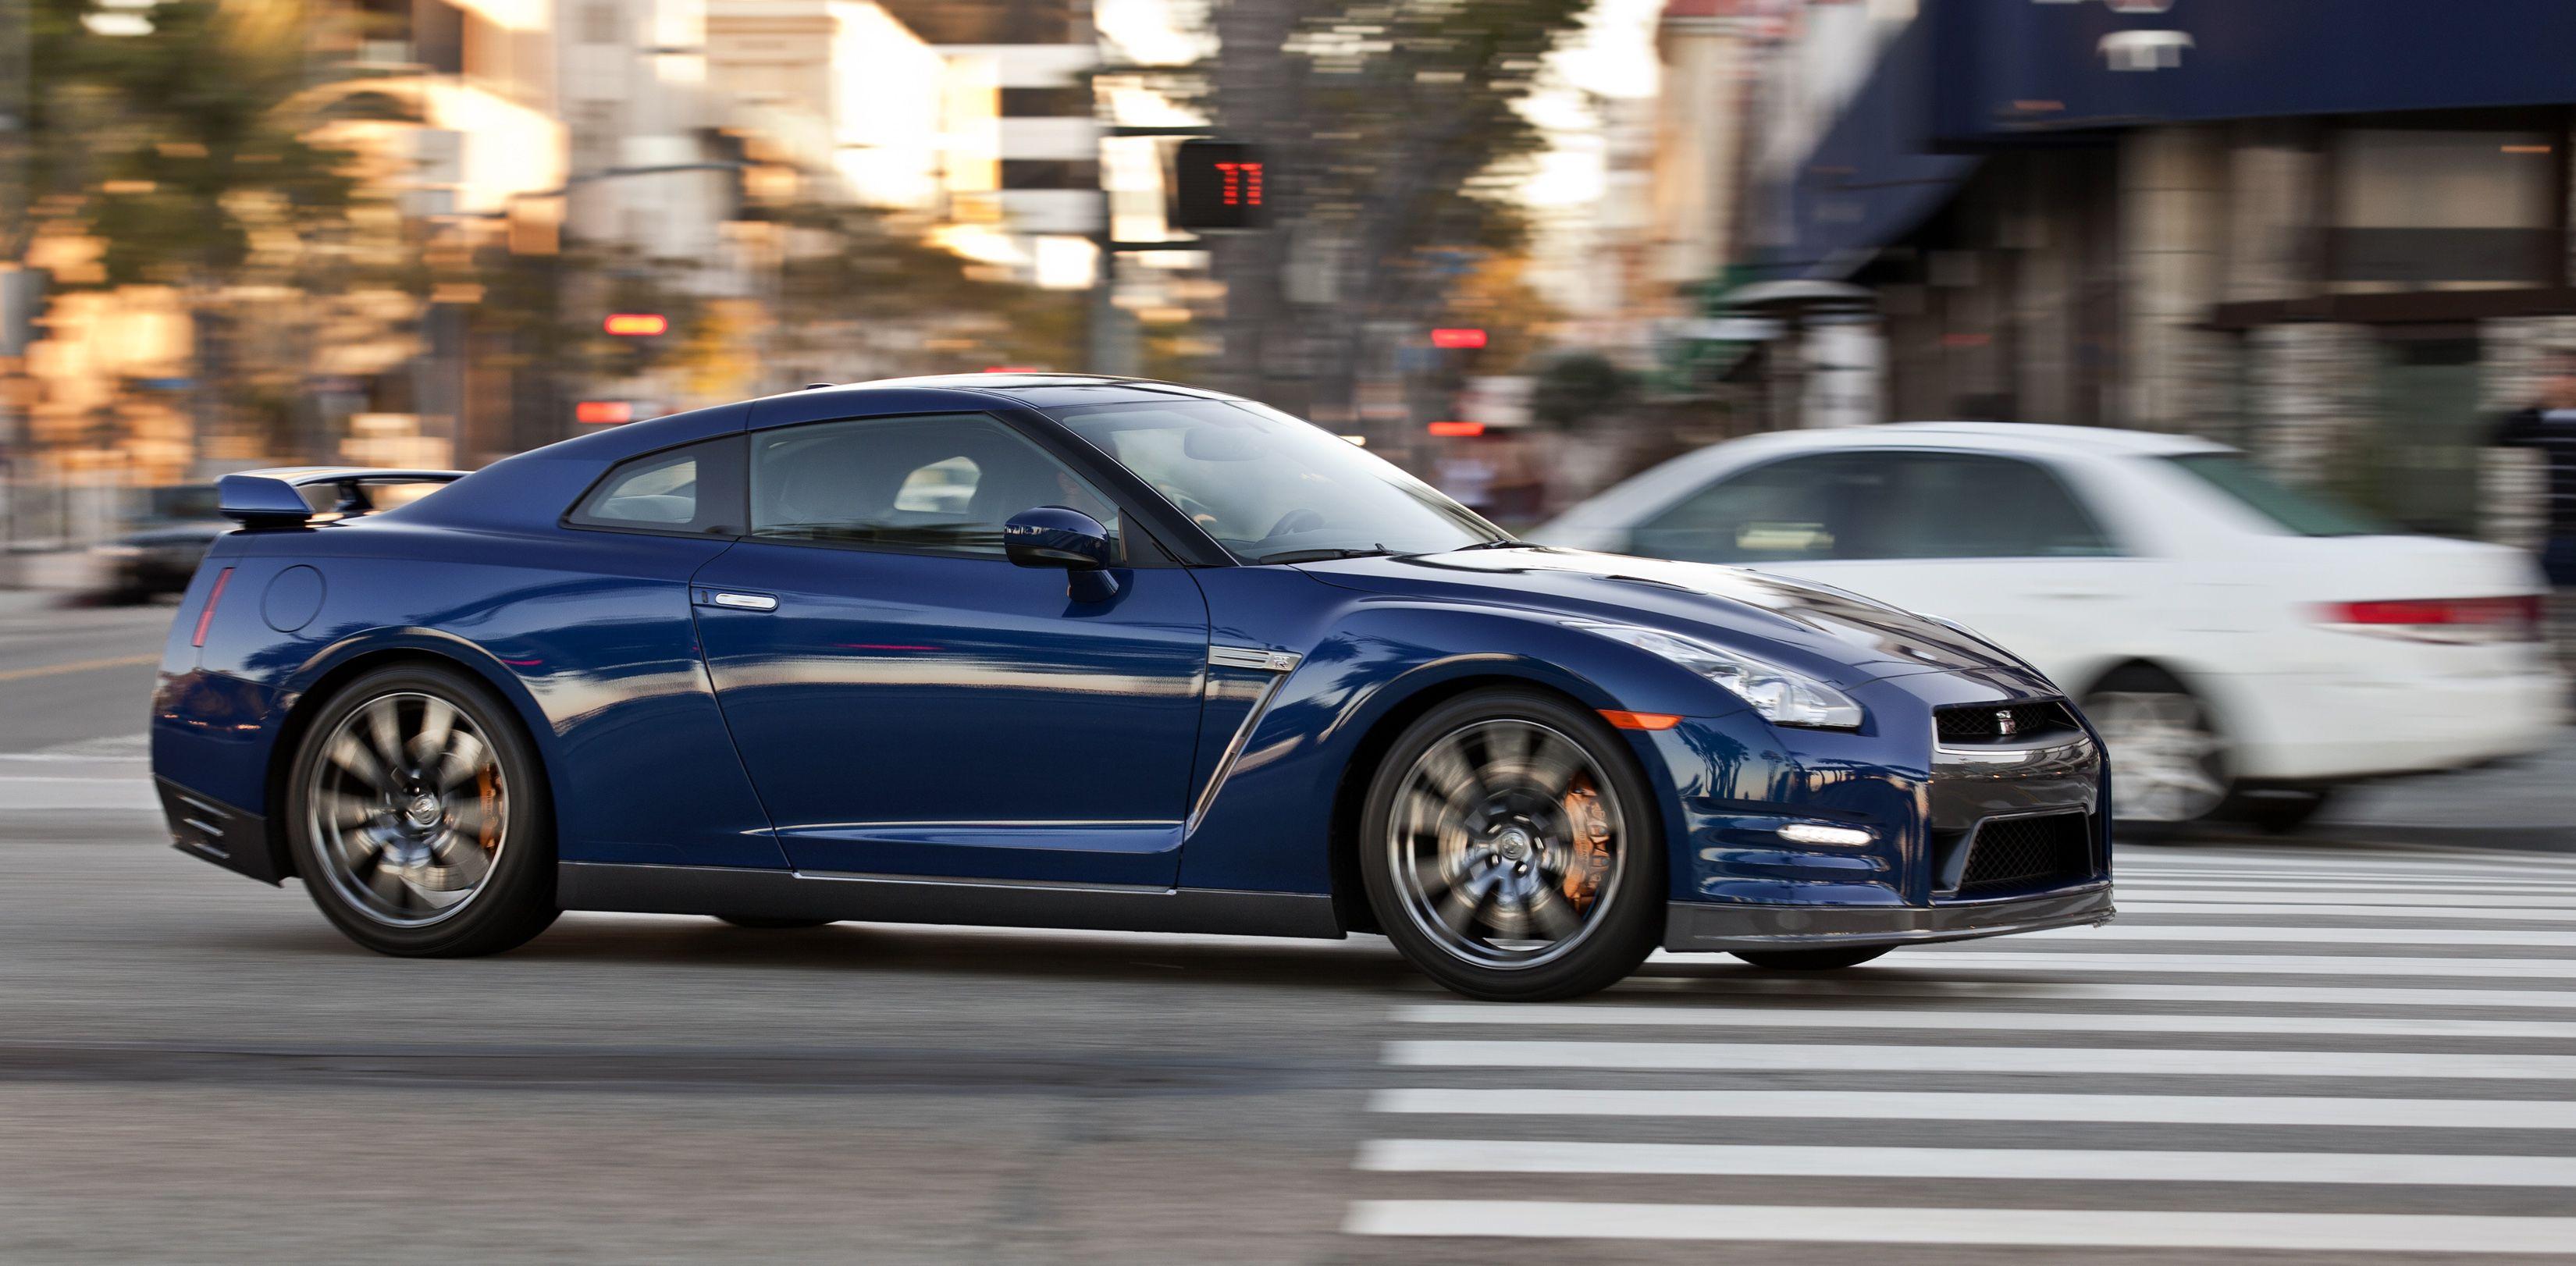 Nissan GT R 0 60 MPH 2 8 seconds Cool Cars Pinterest